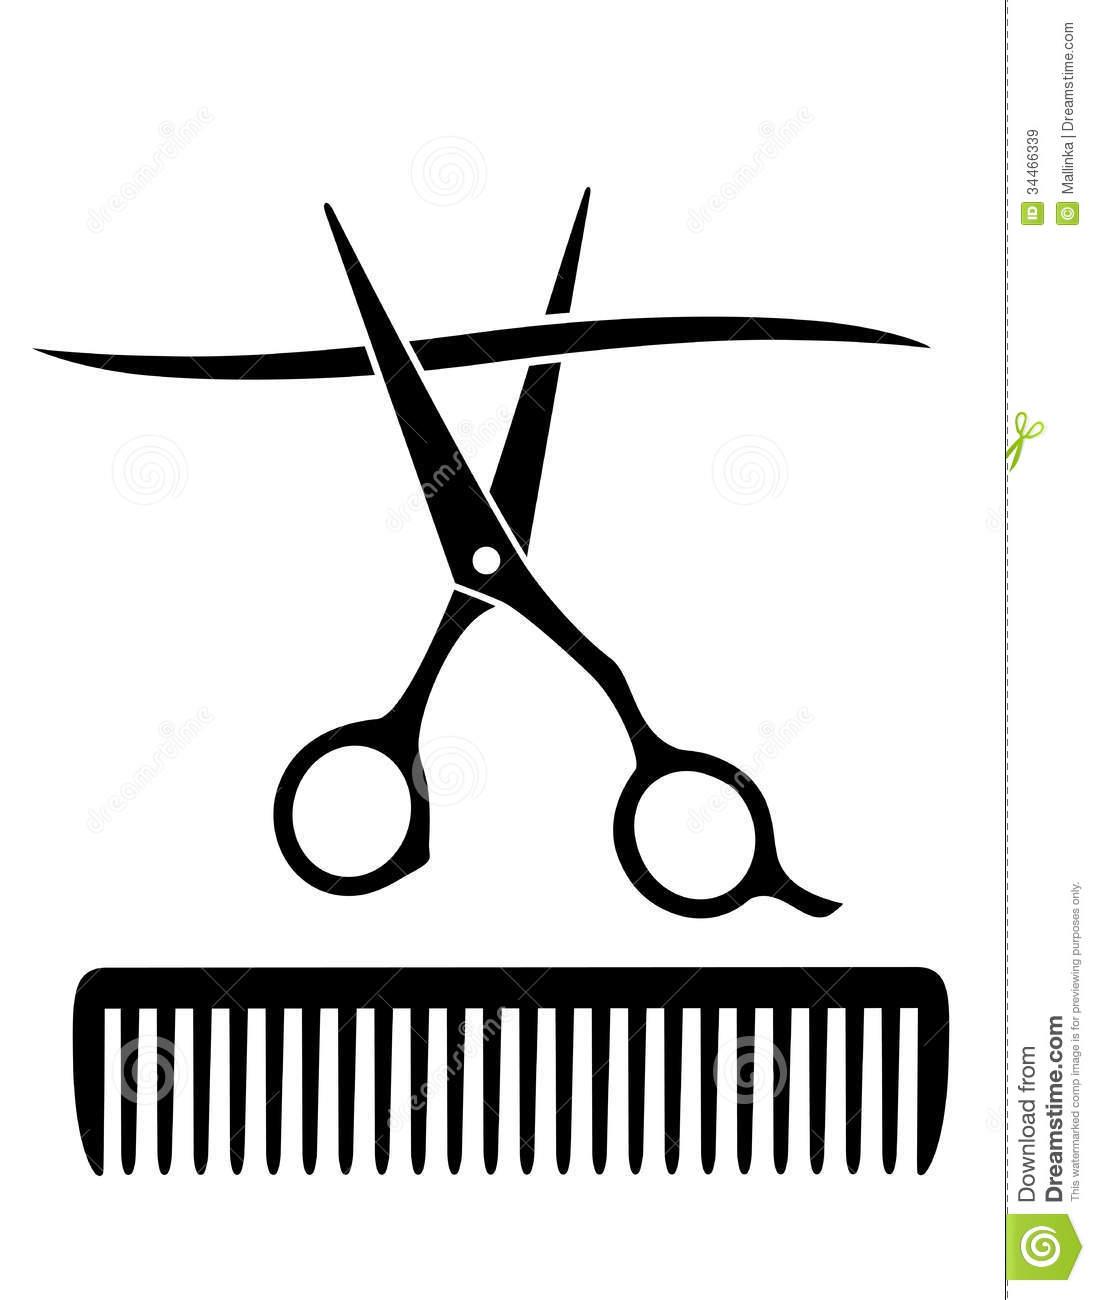 hair%20scissors%20and%20comb%20clip%20art